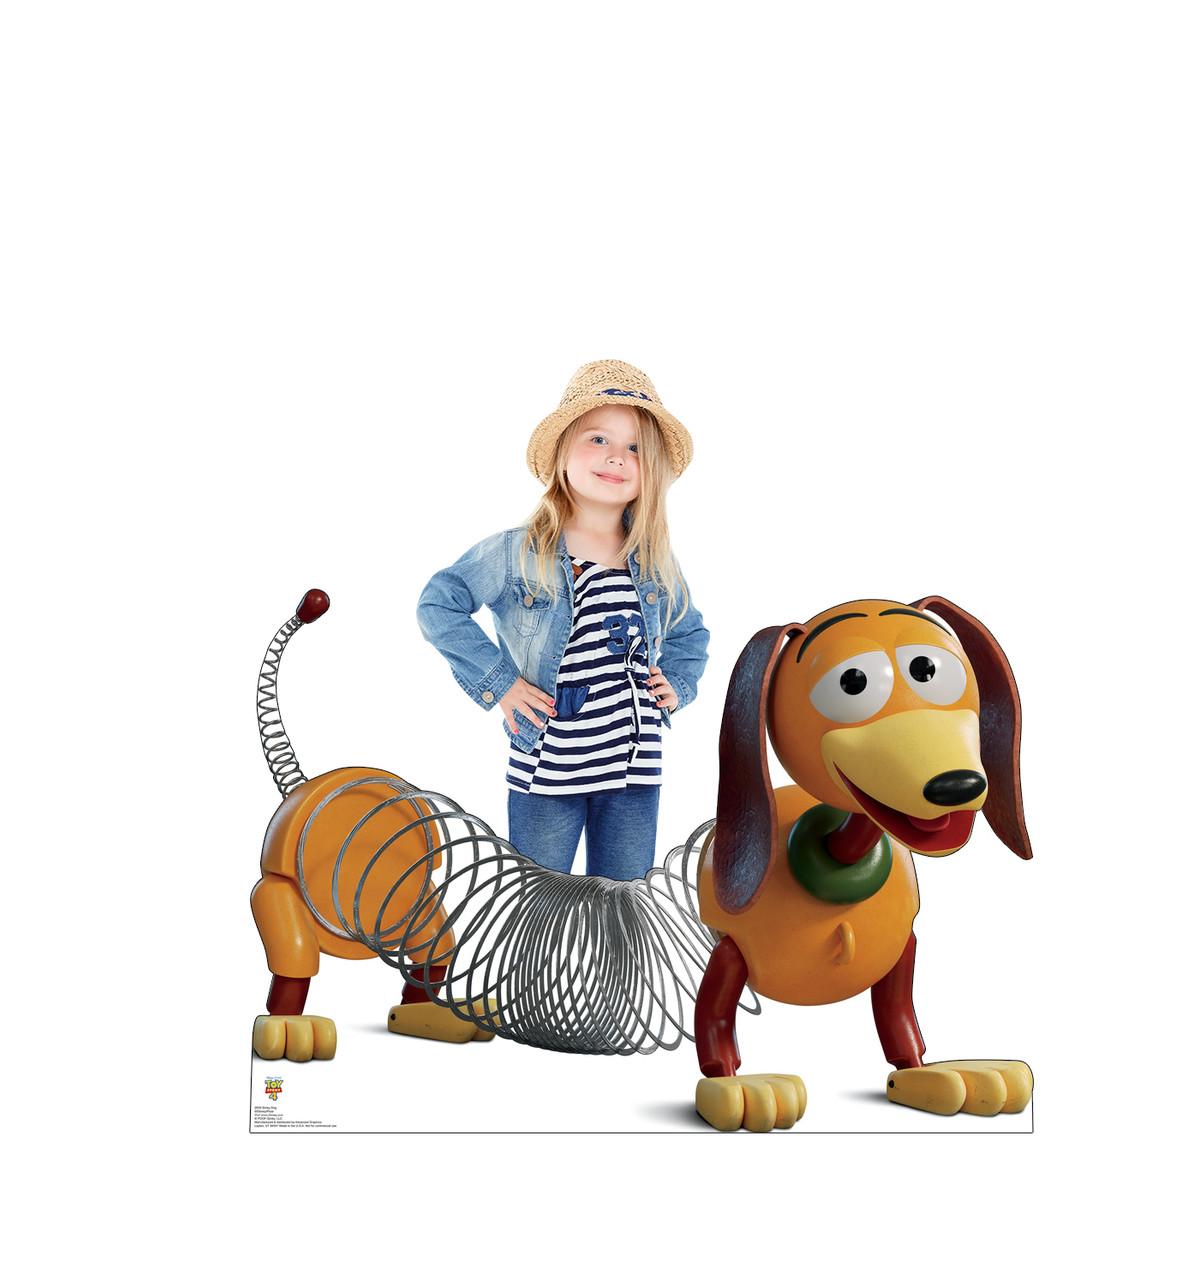 Slinky Dog - Toy Story 4 Cardboard Cutout  Lifesize